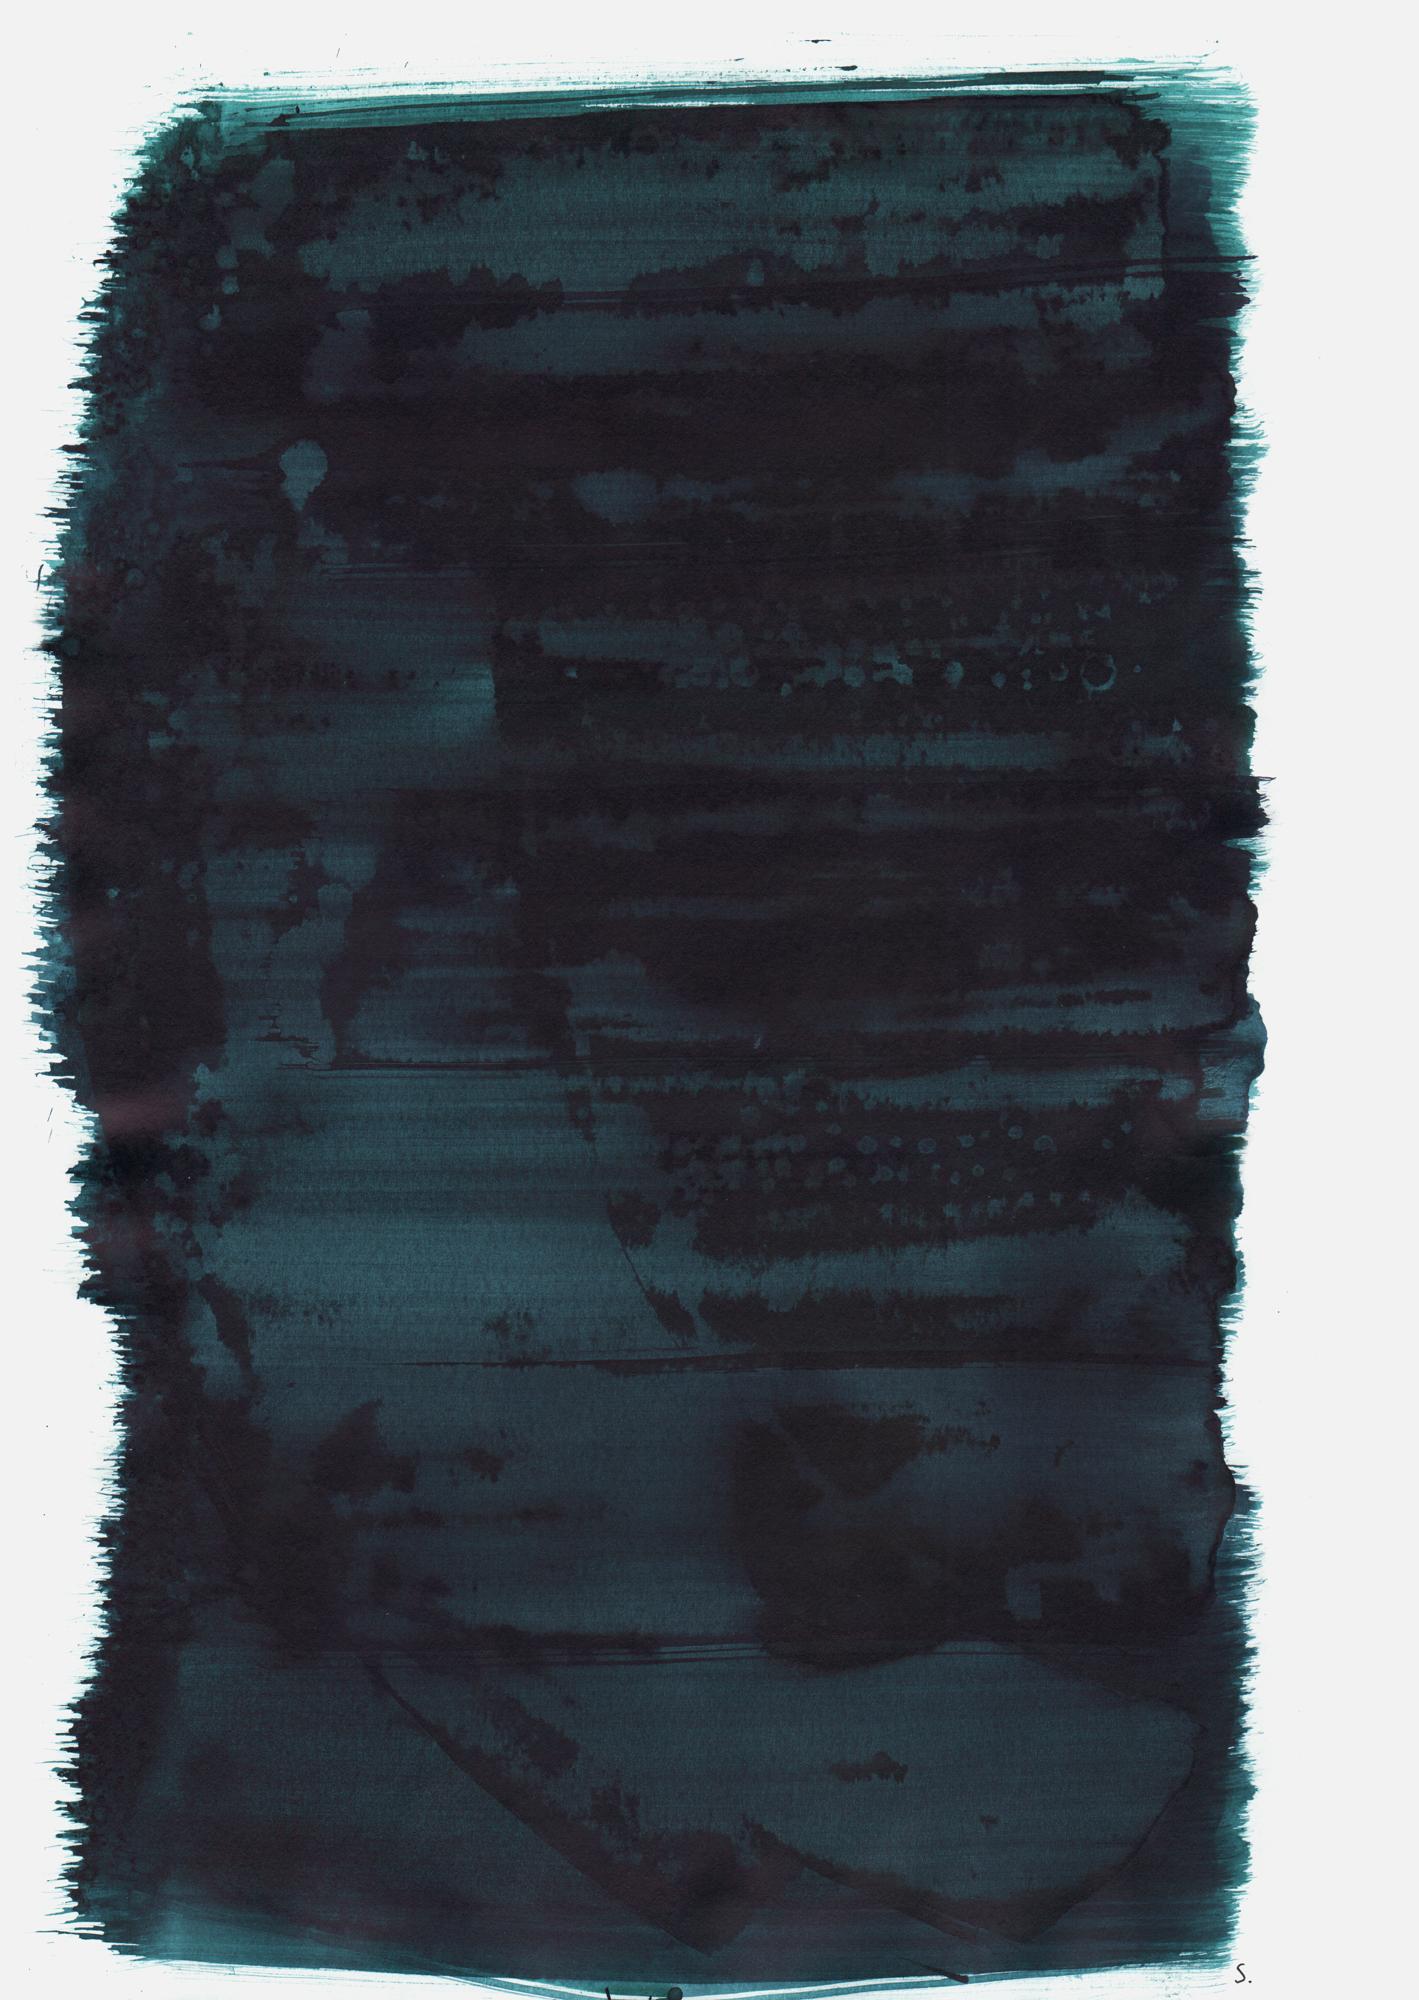 """An Tana Löwengart"", 2019, Tusche auf Papier, 48 x 36cm; ©: Konstanze Sailer [Löwengart, Tana; * 16.10.1938 in Frankfurt; deportiert aus München; † 25.11.1941 in Kowno]"